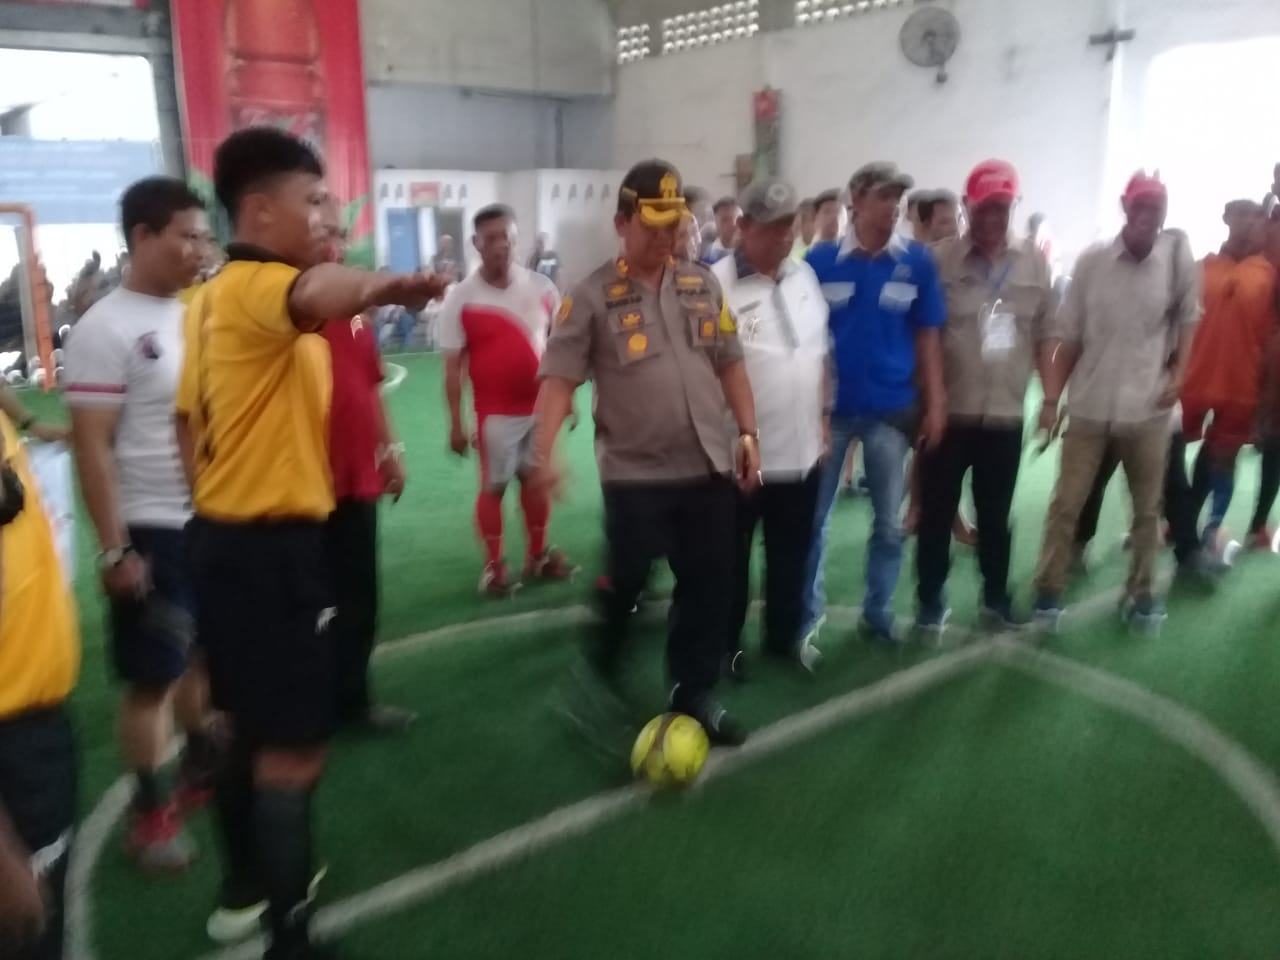 Kapolres Pelabuhan Belawan AKBP Ikhwan Lubis  melakukan tendangan perdana